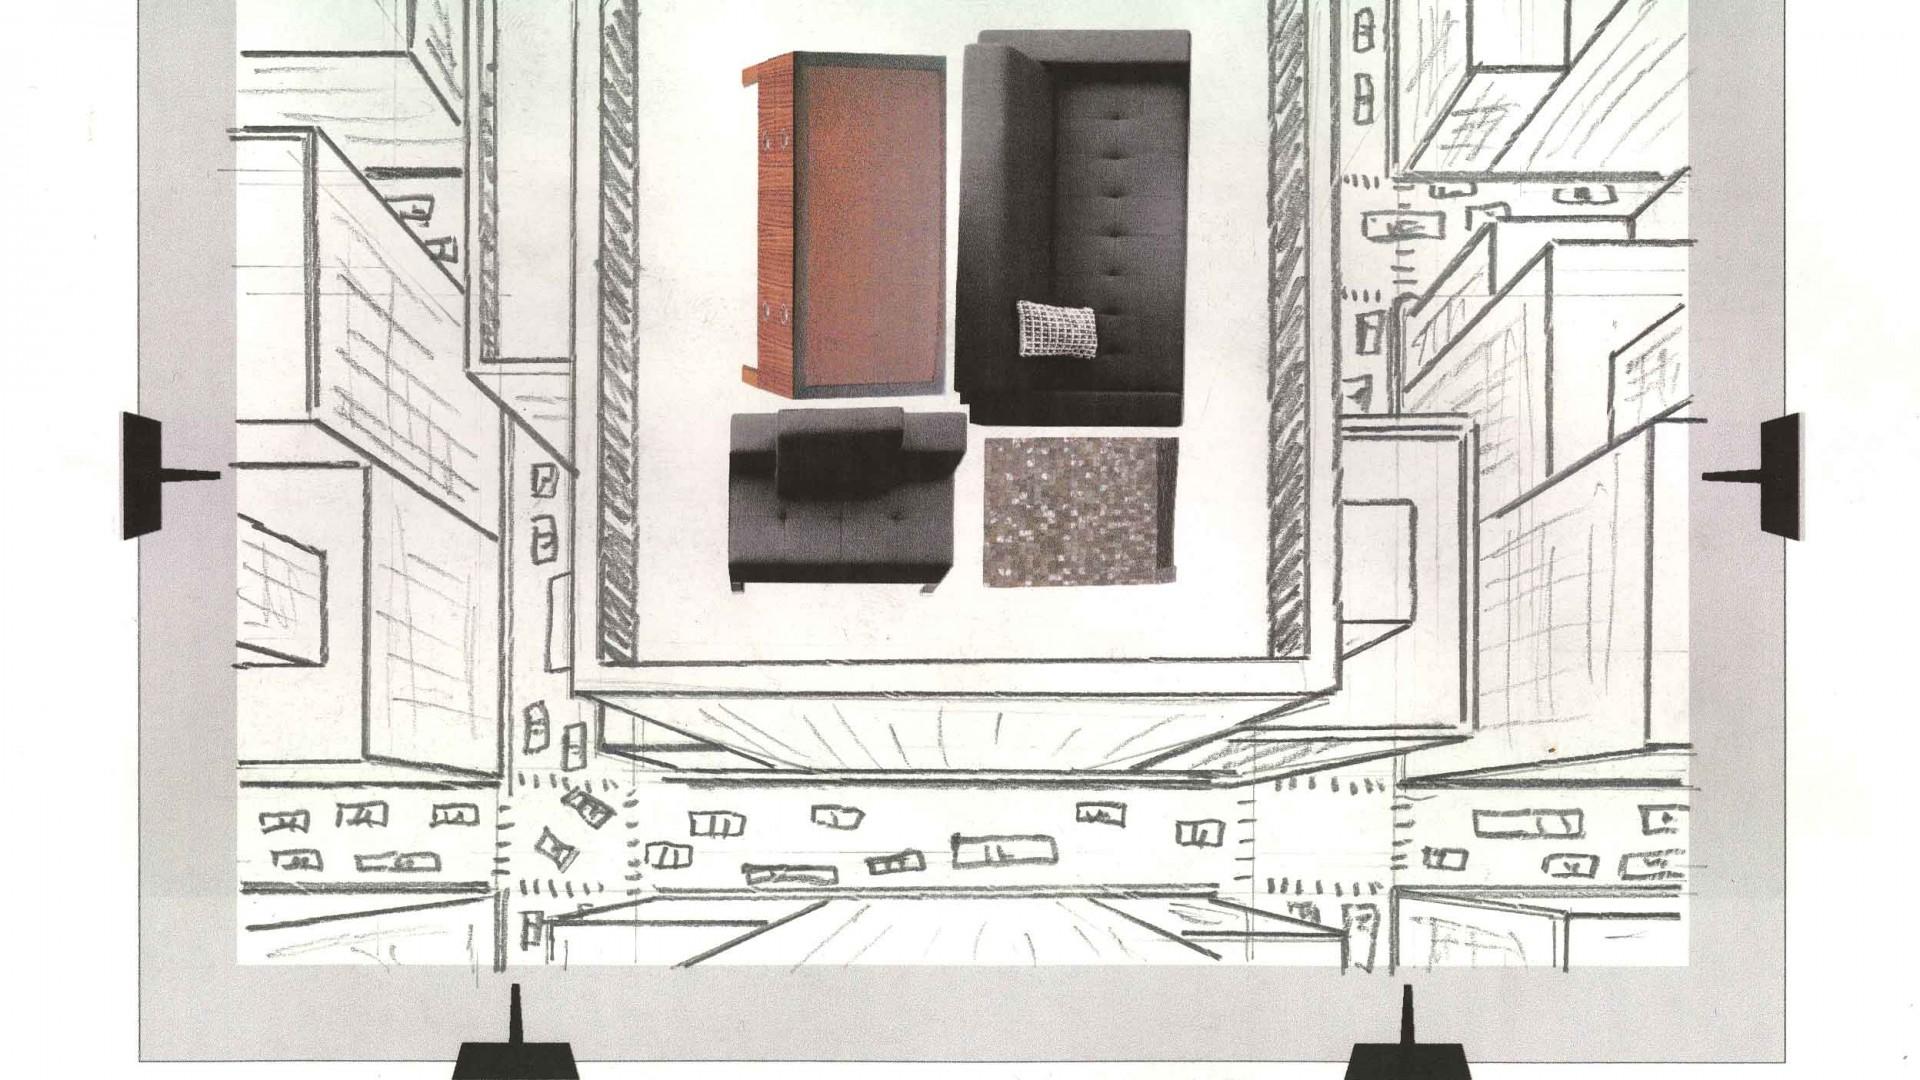 Bernhardt Hospitality Transcending to New Heights Exhibit, original concept sketch.